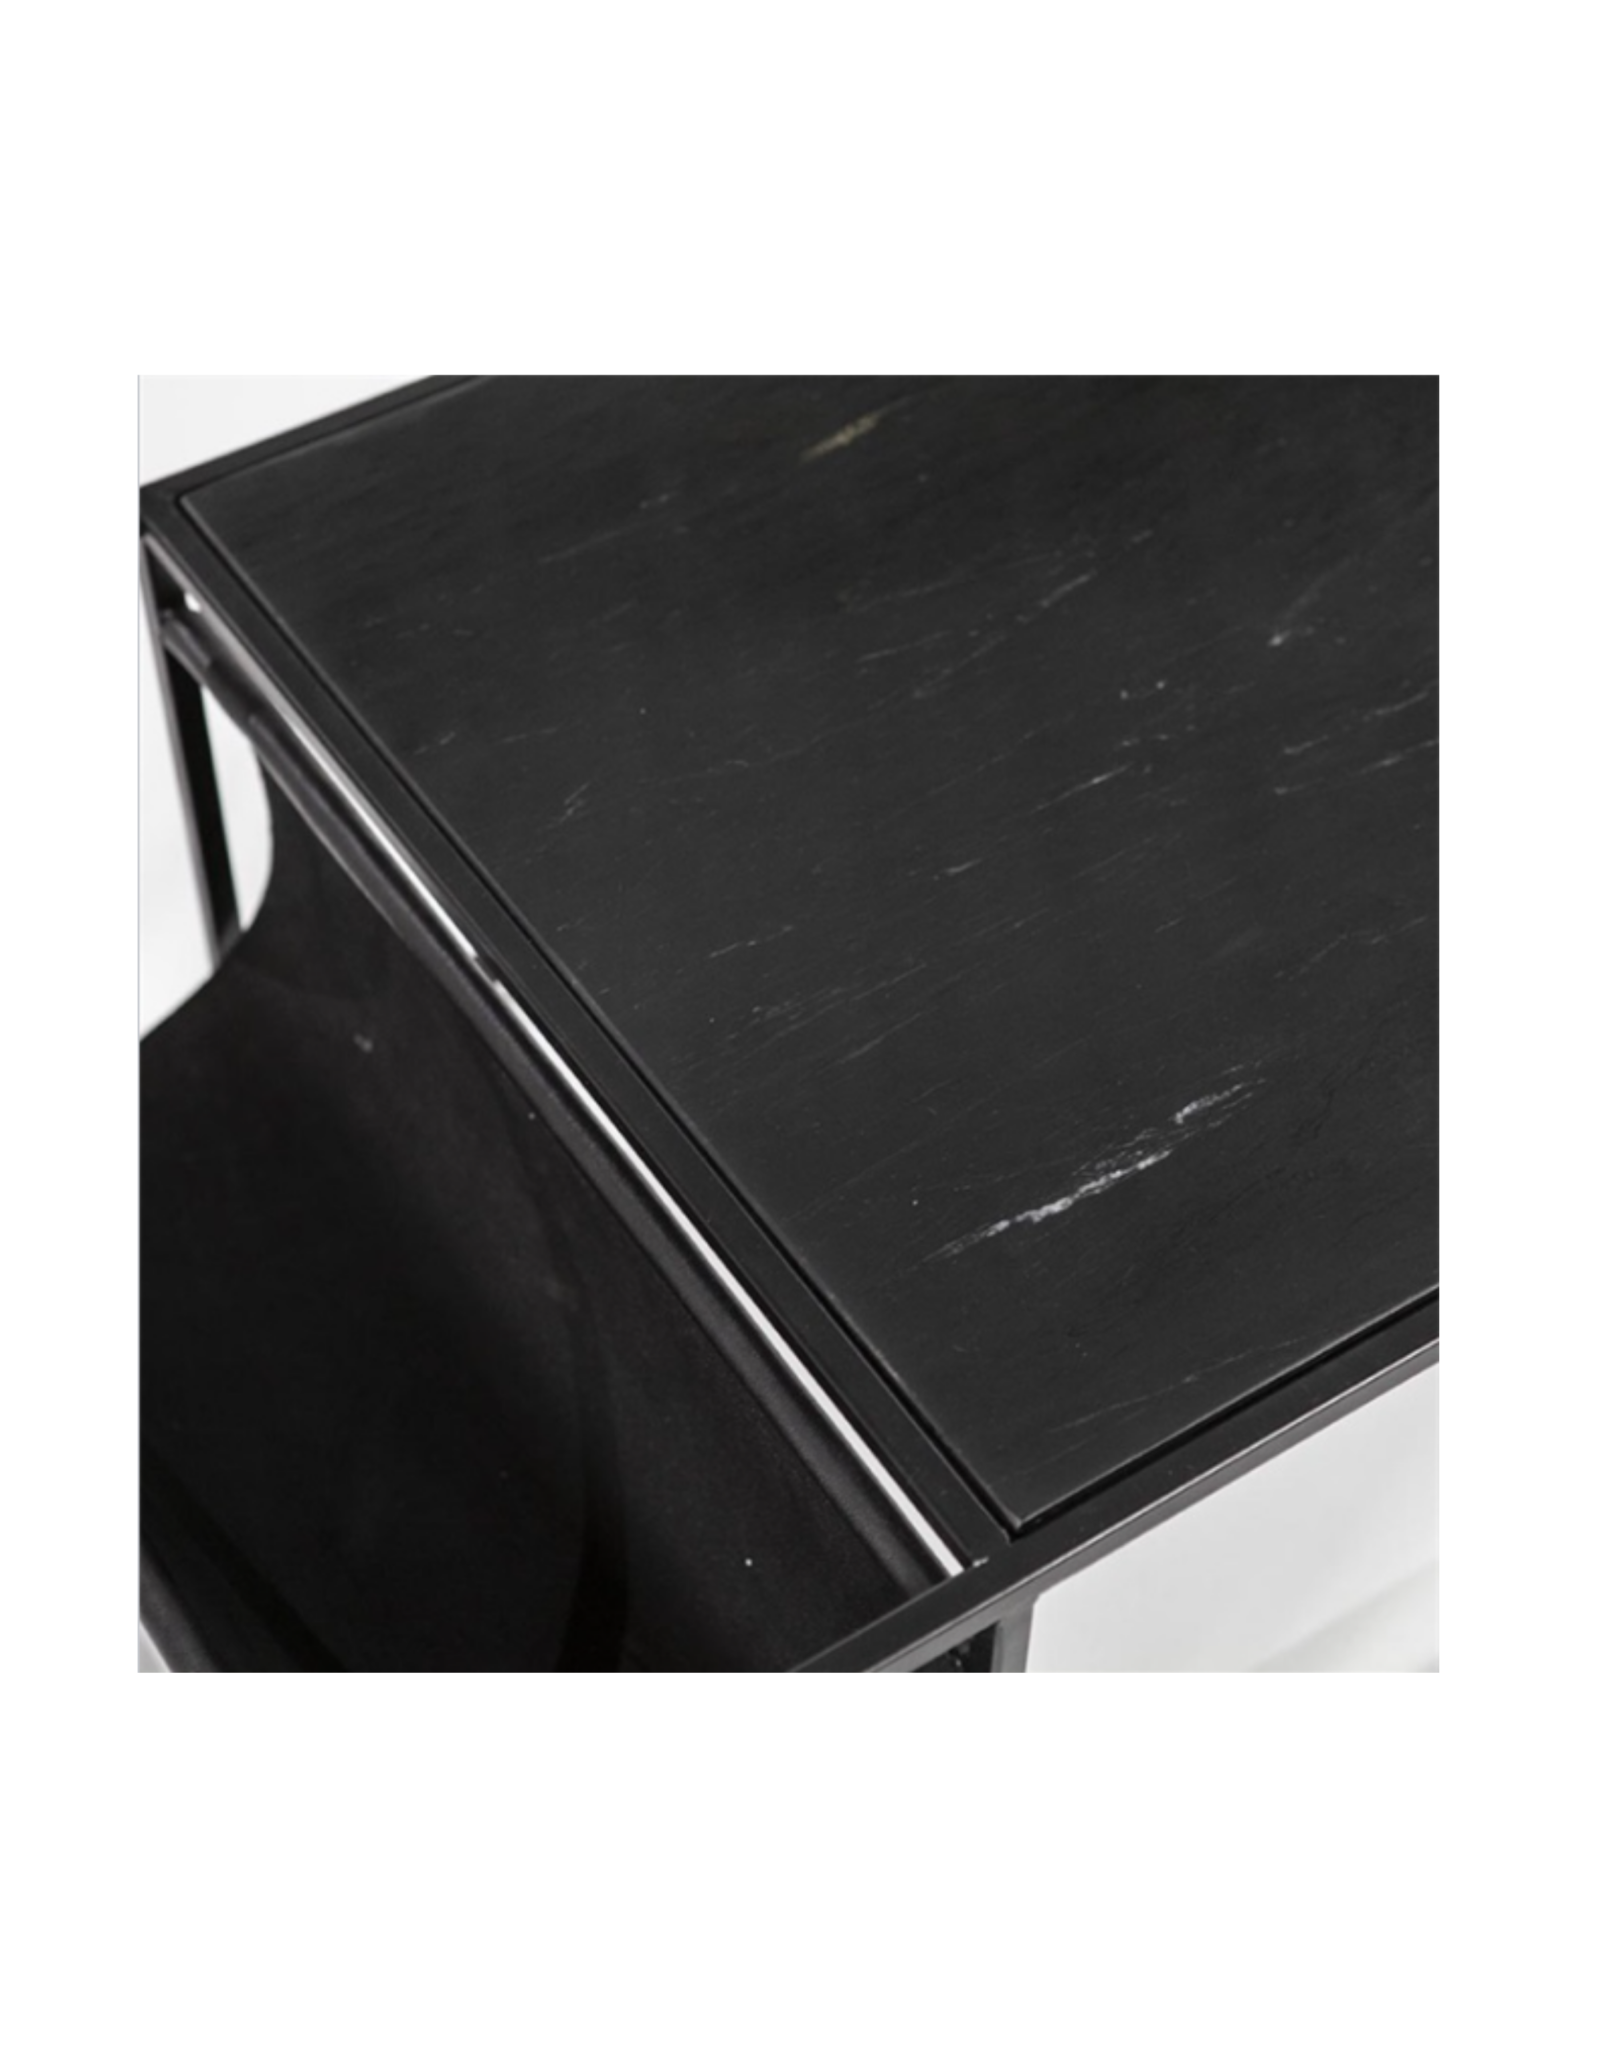 Salontafel Zwart Marmer 120 x 60 cm